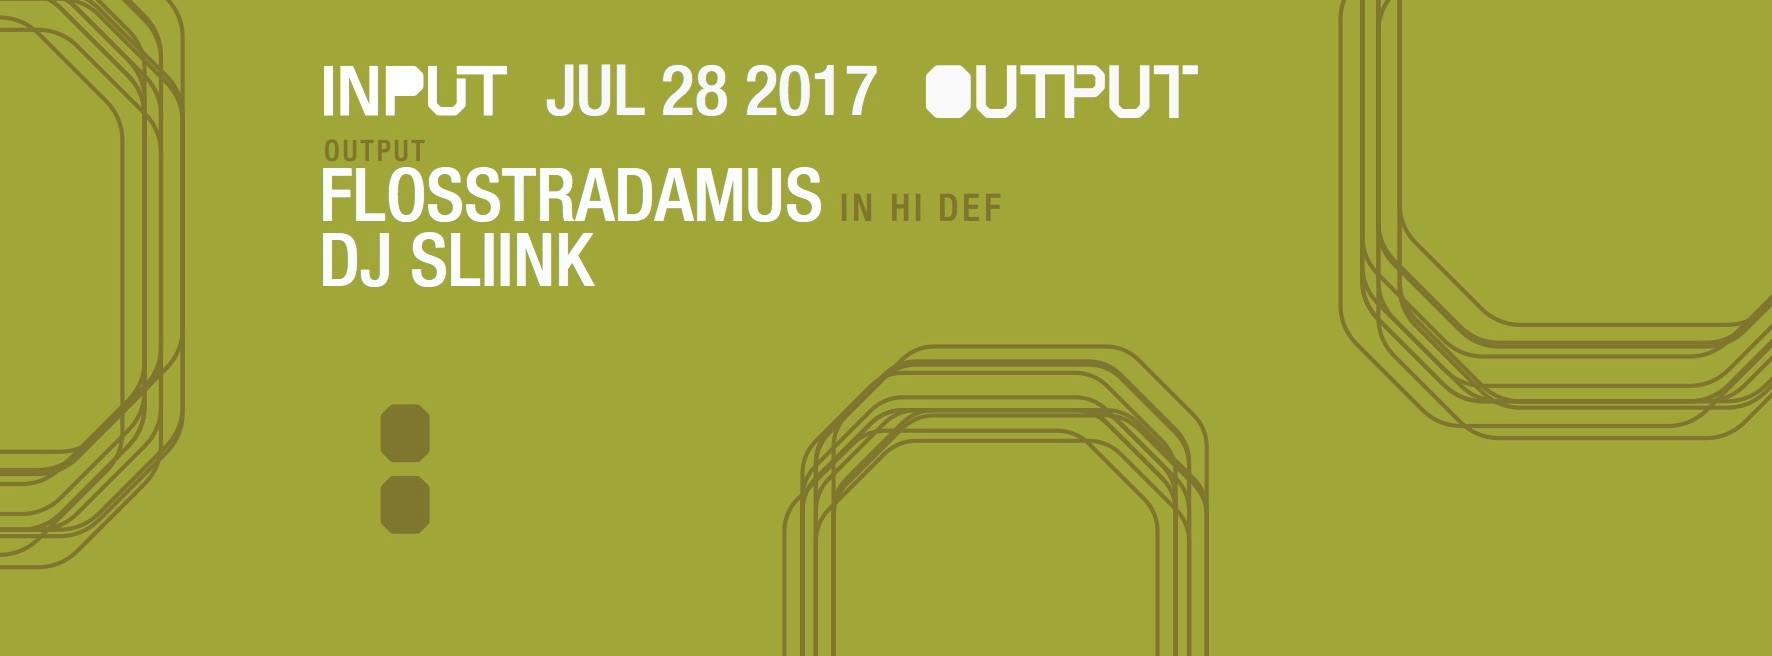 Flosstradamus Output Robbie Lumpkin Promotions